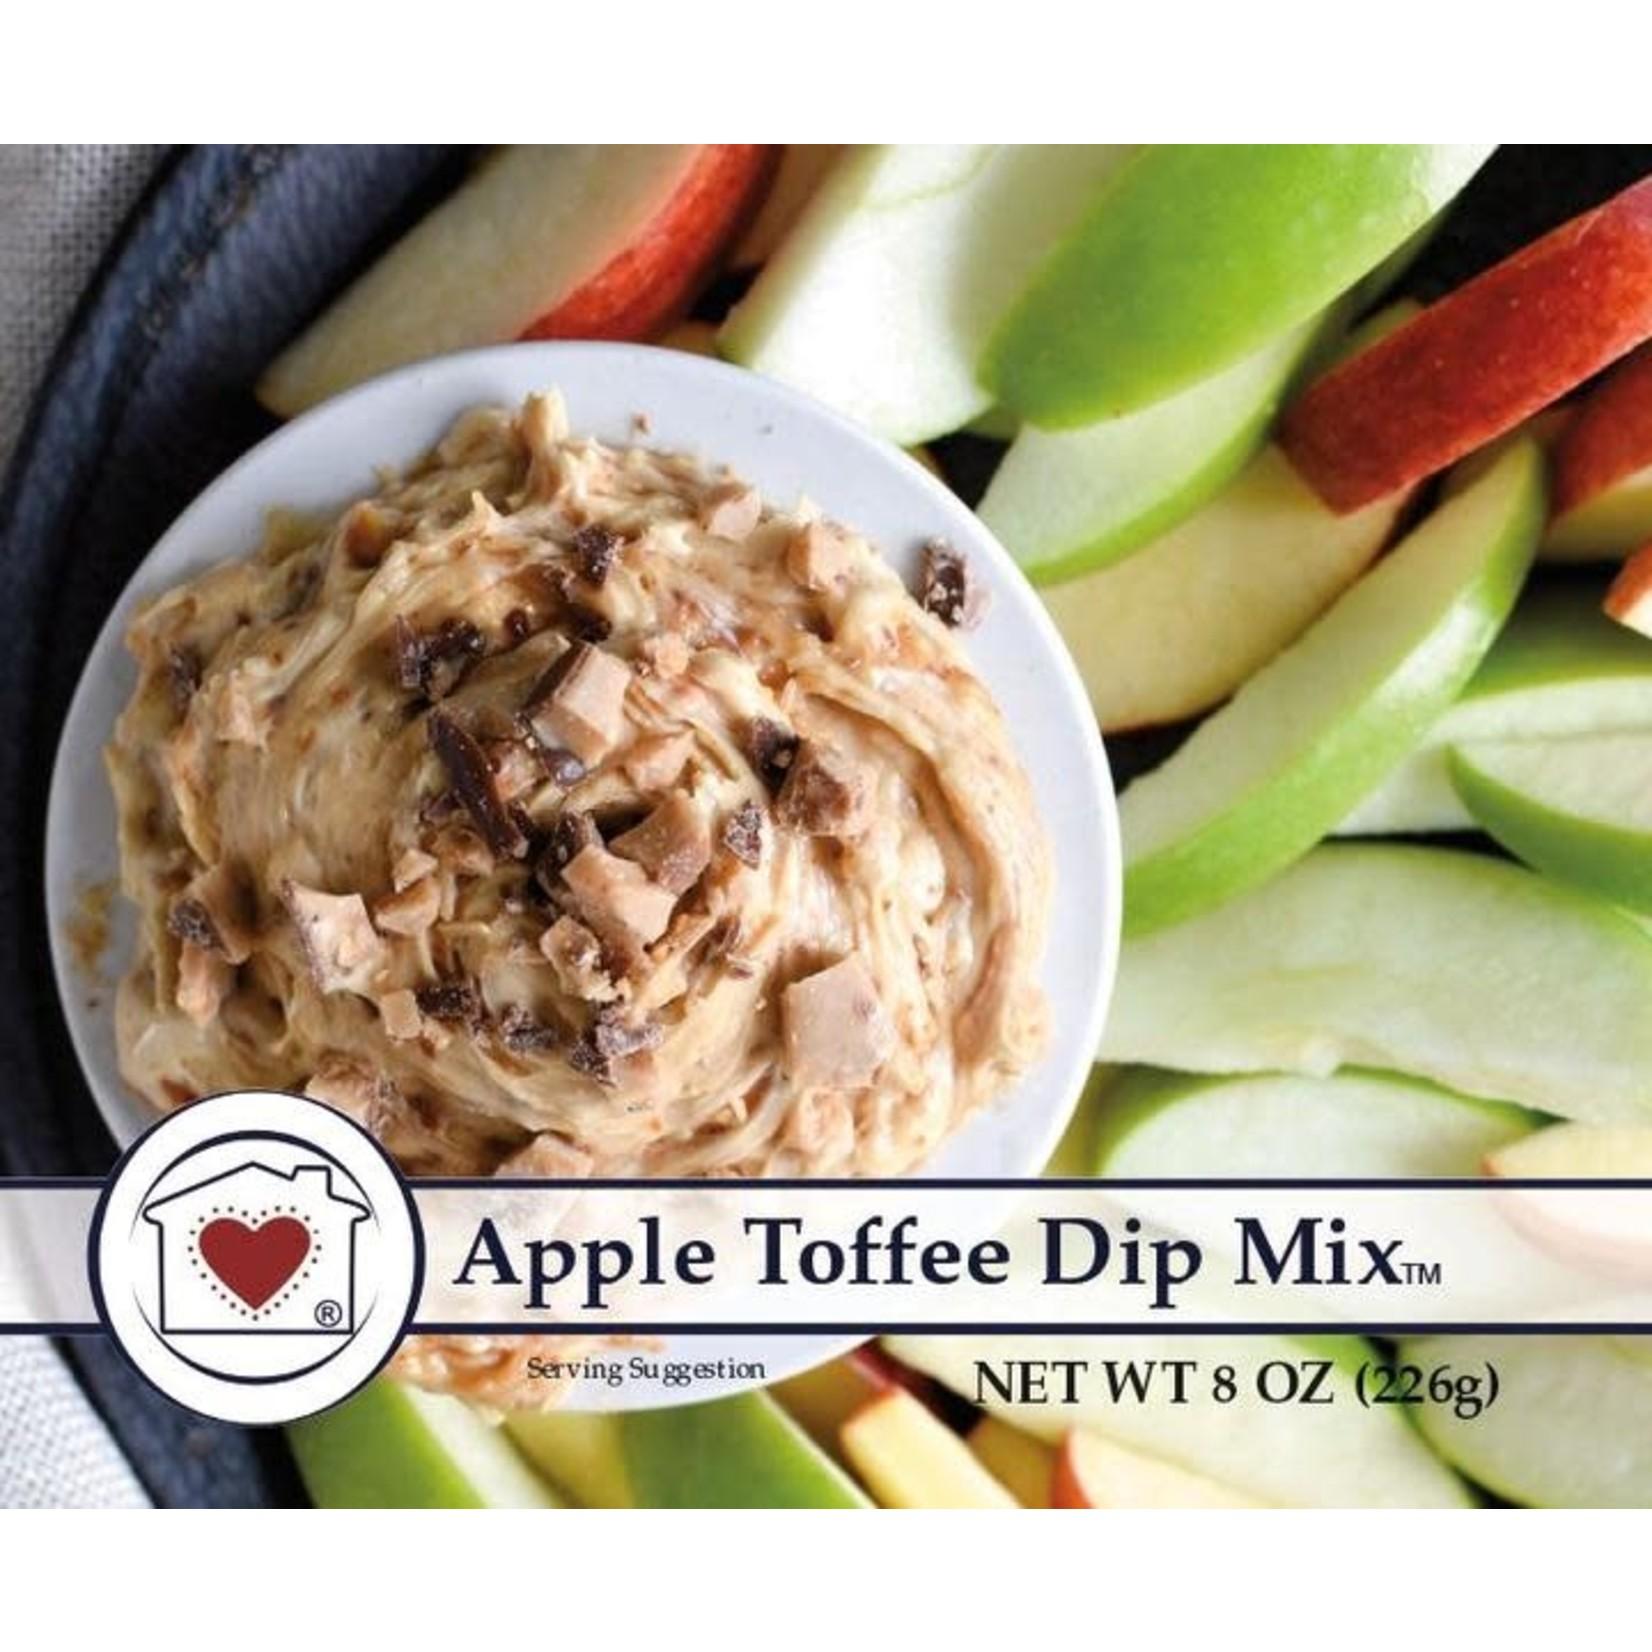 APPLE TOFFEE DIP MIX